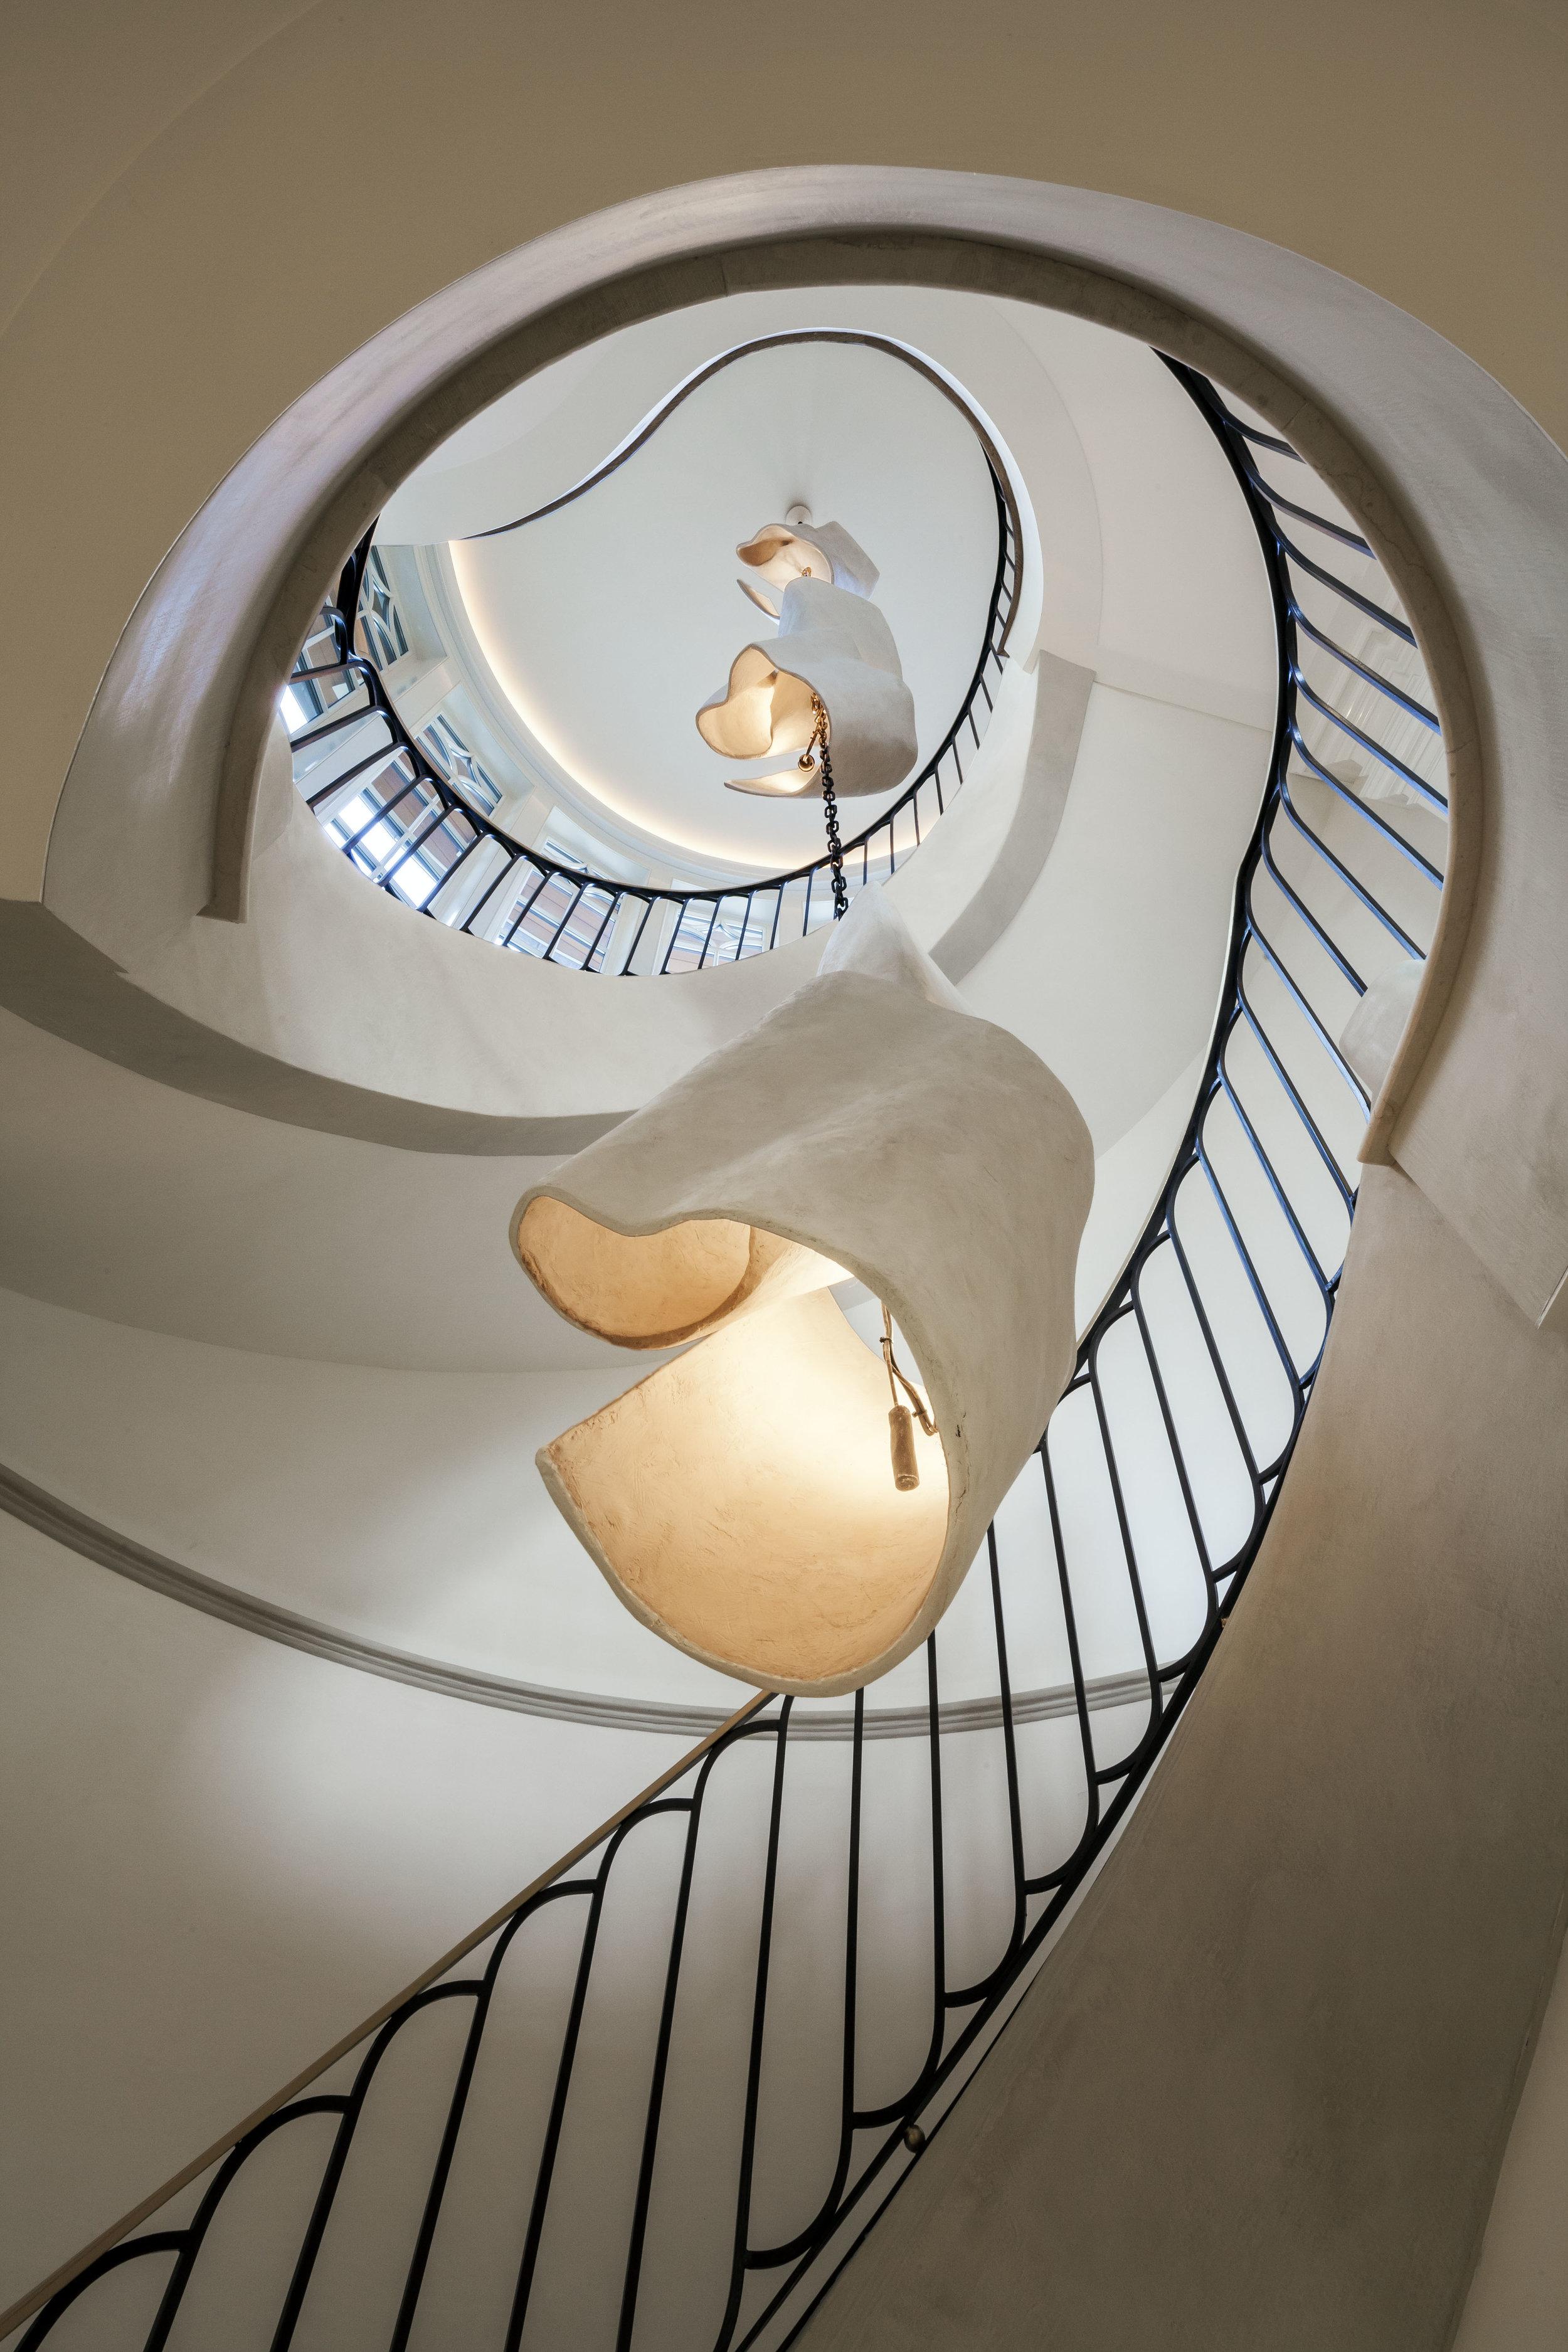 custom architectural lighting design in